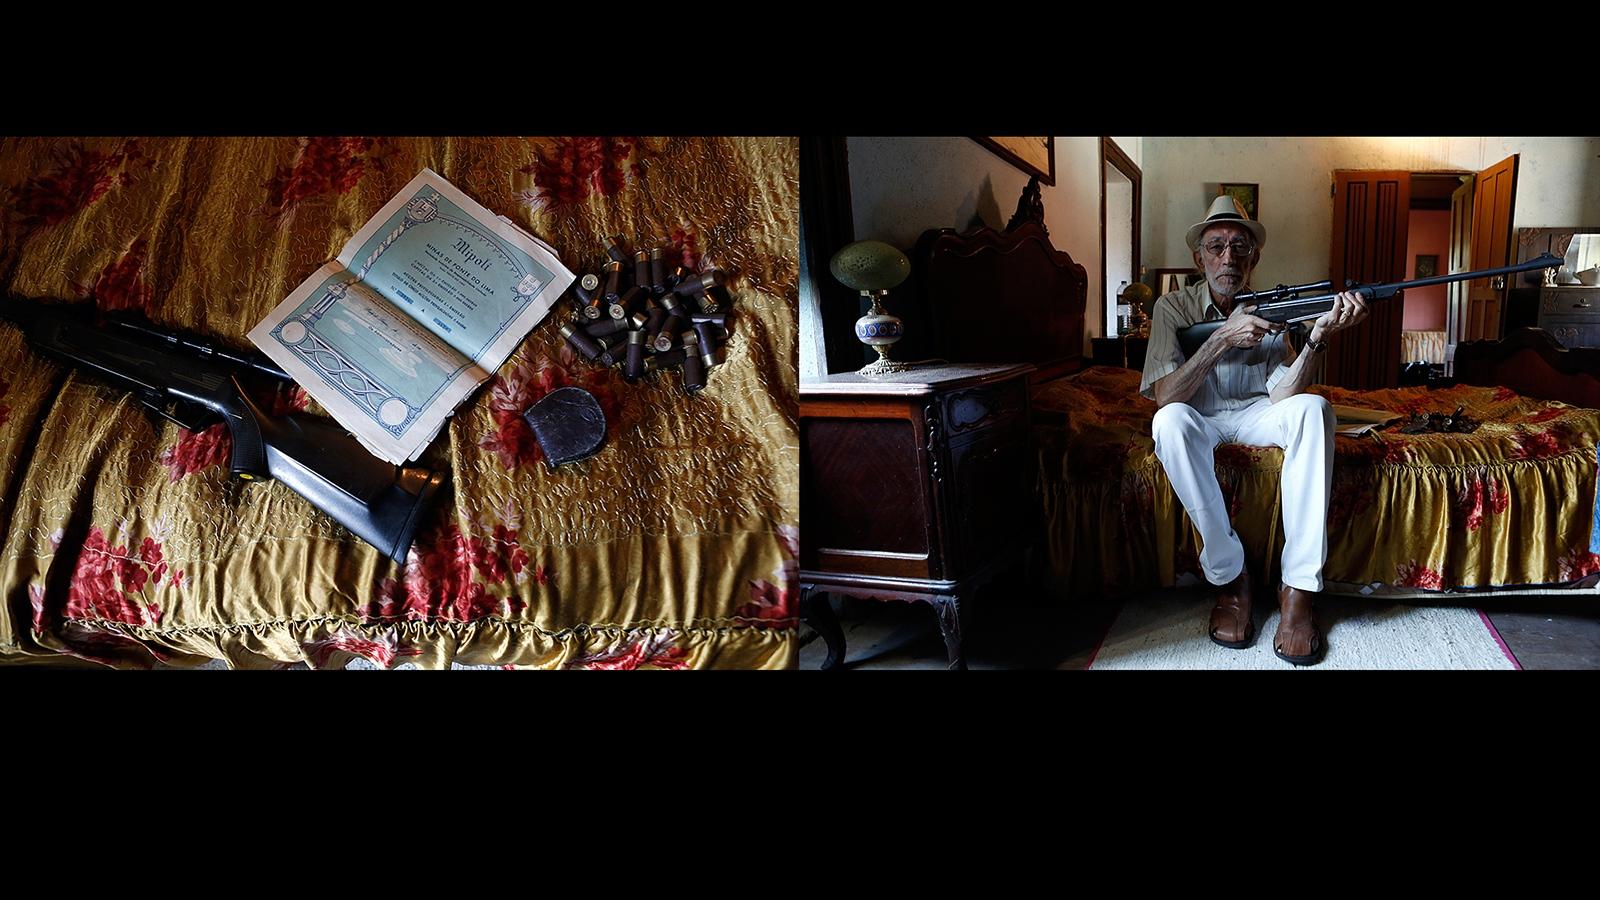 Art and Documentary Photography - Loading __TheresaOrtolani_01.jpg